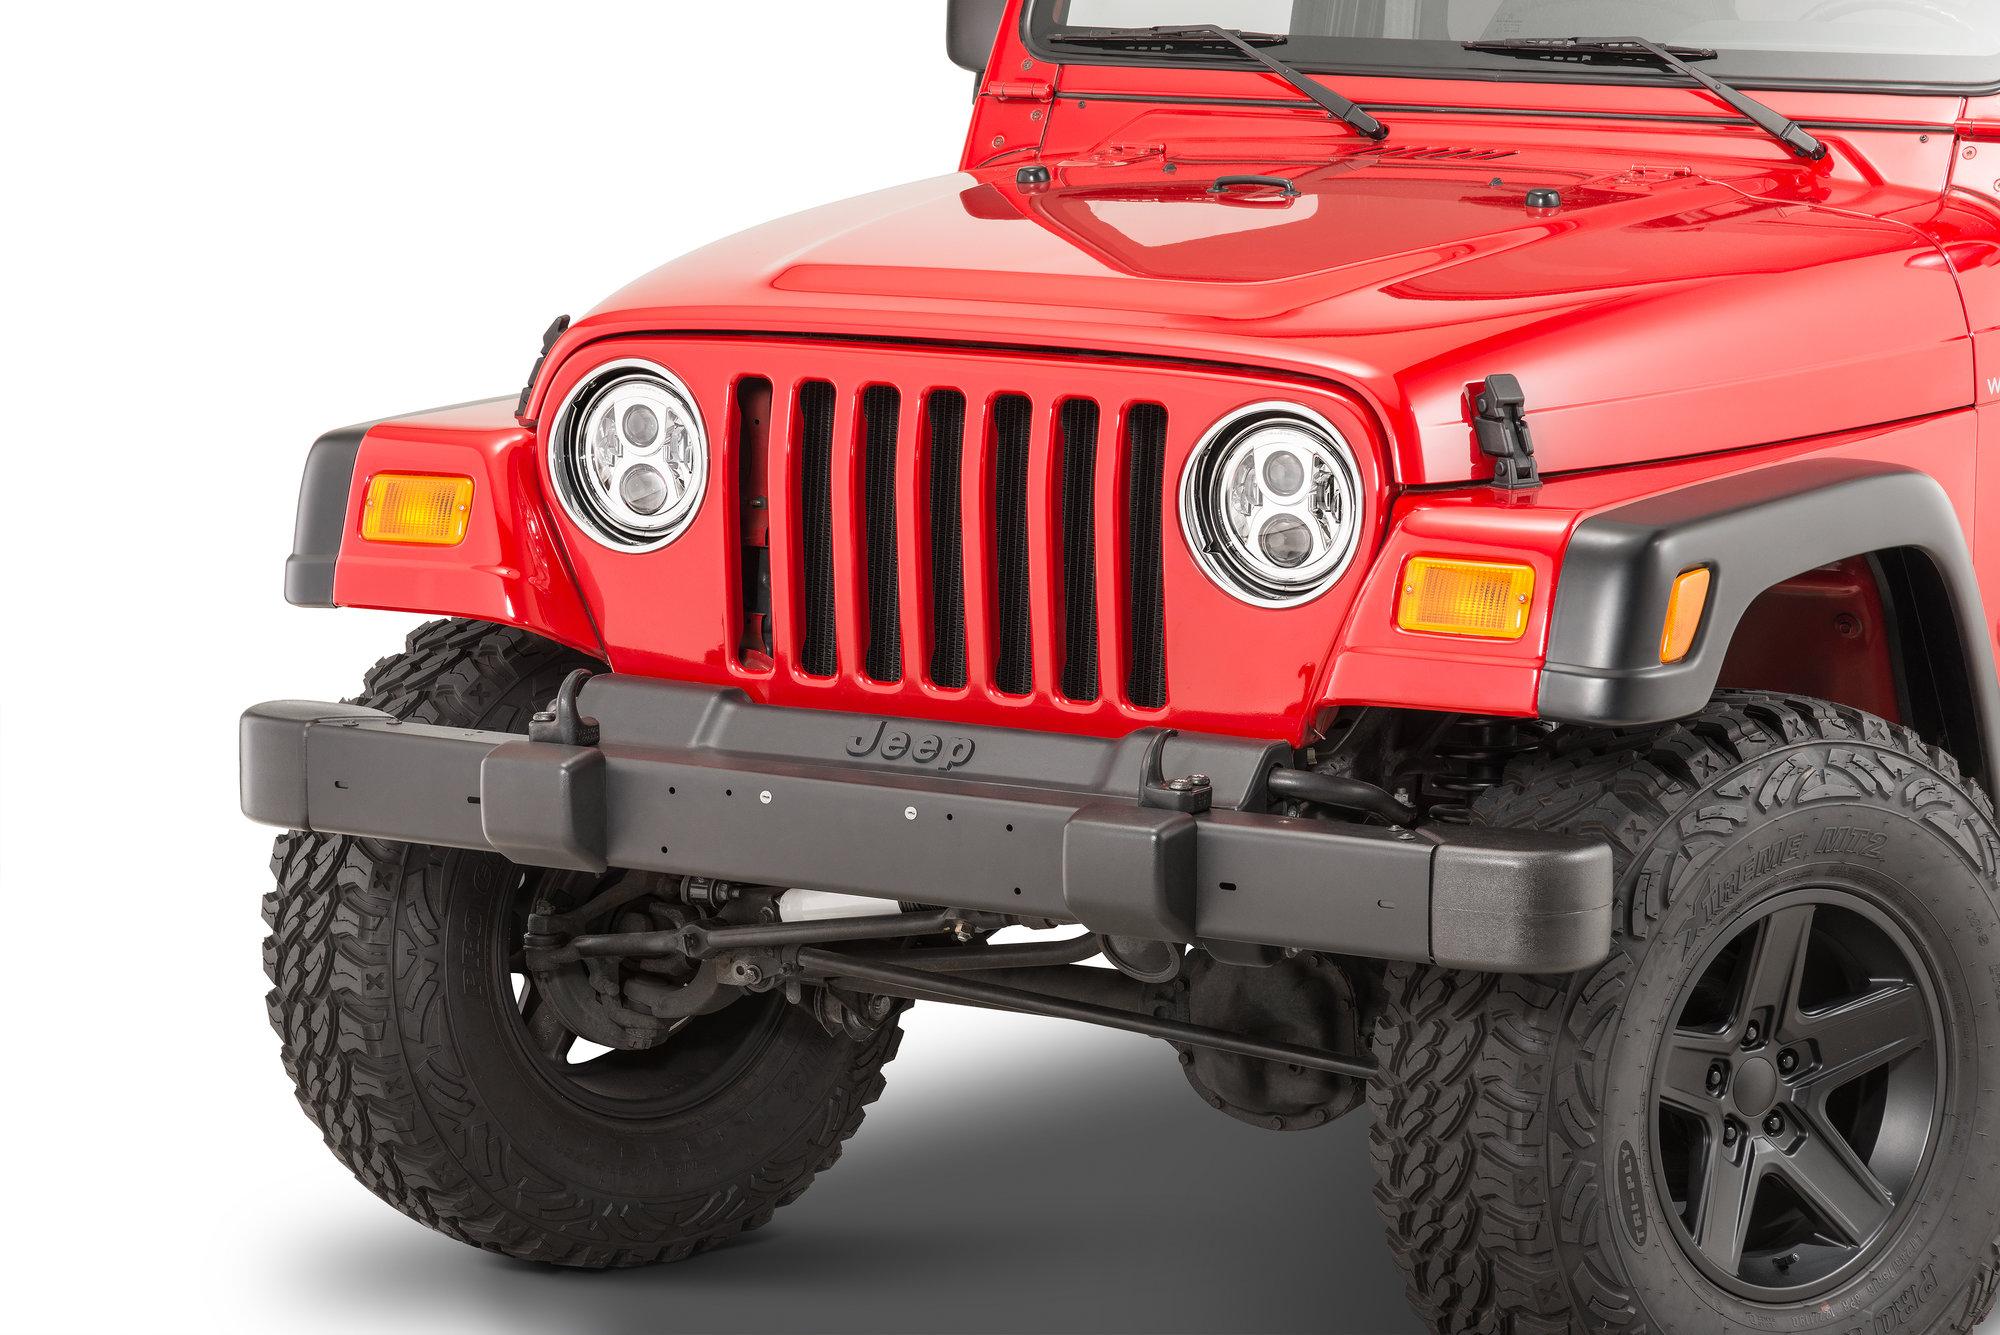 hight resolution of j w speaker 8700 evolution 2 led headlight kit for 45 06 jeep wrangler tj tj unlimited cj quadratec